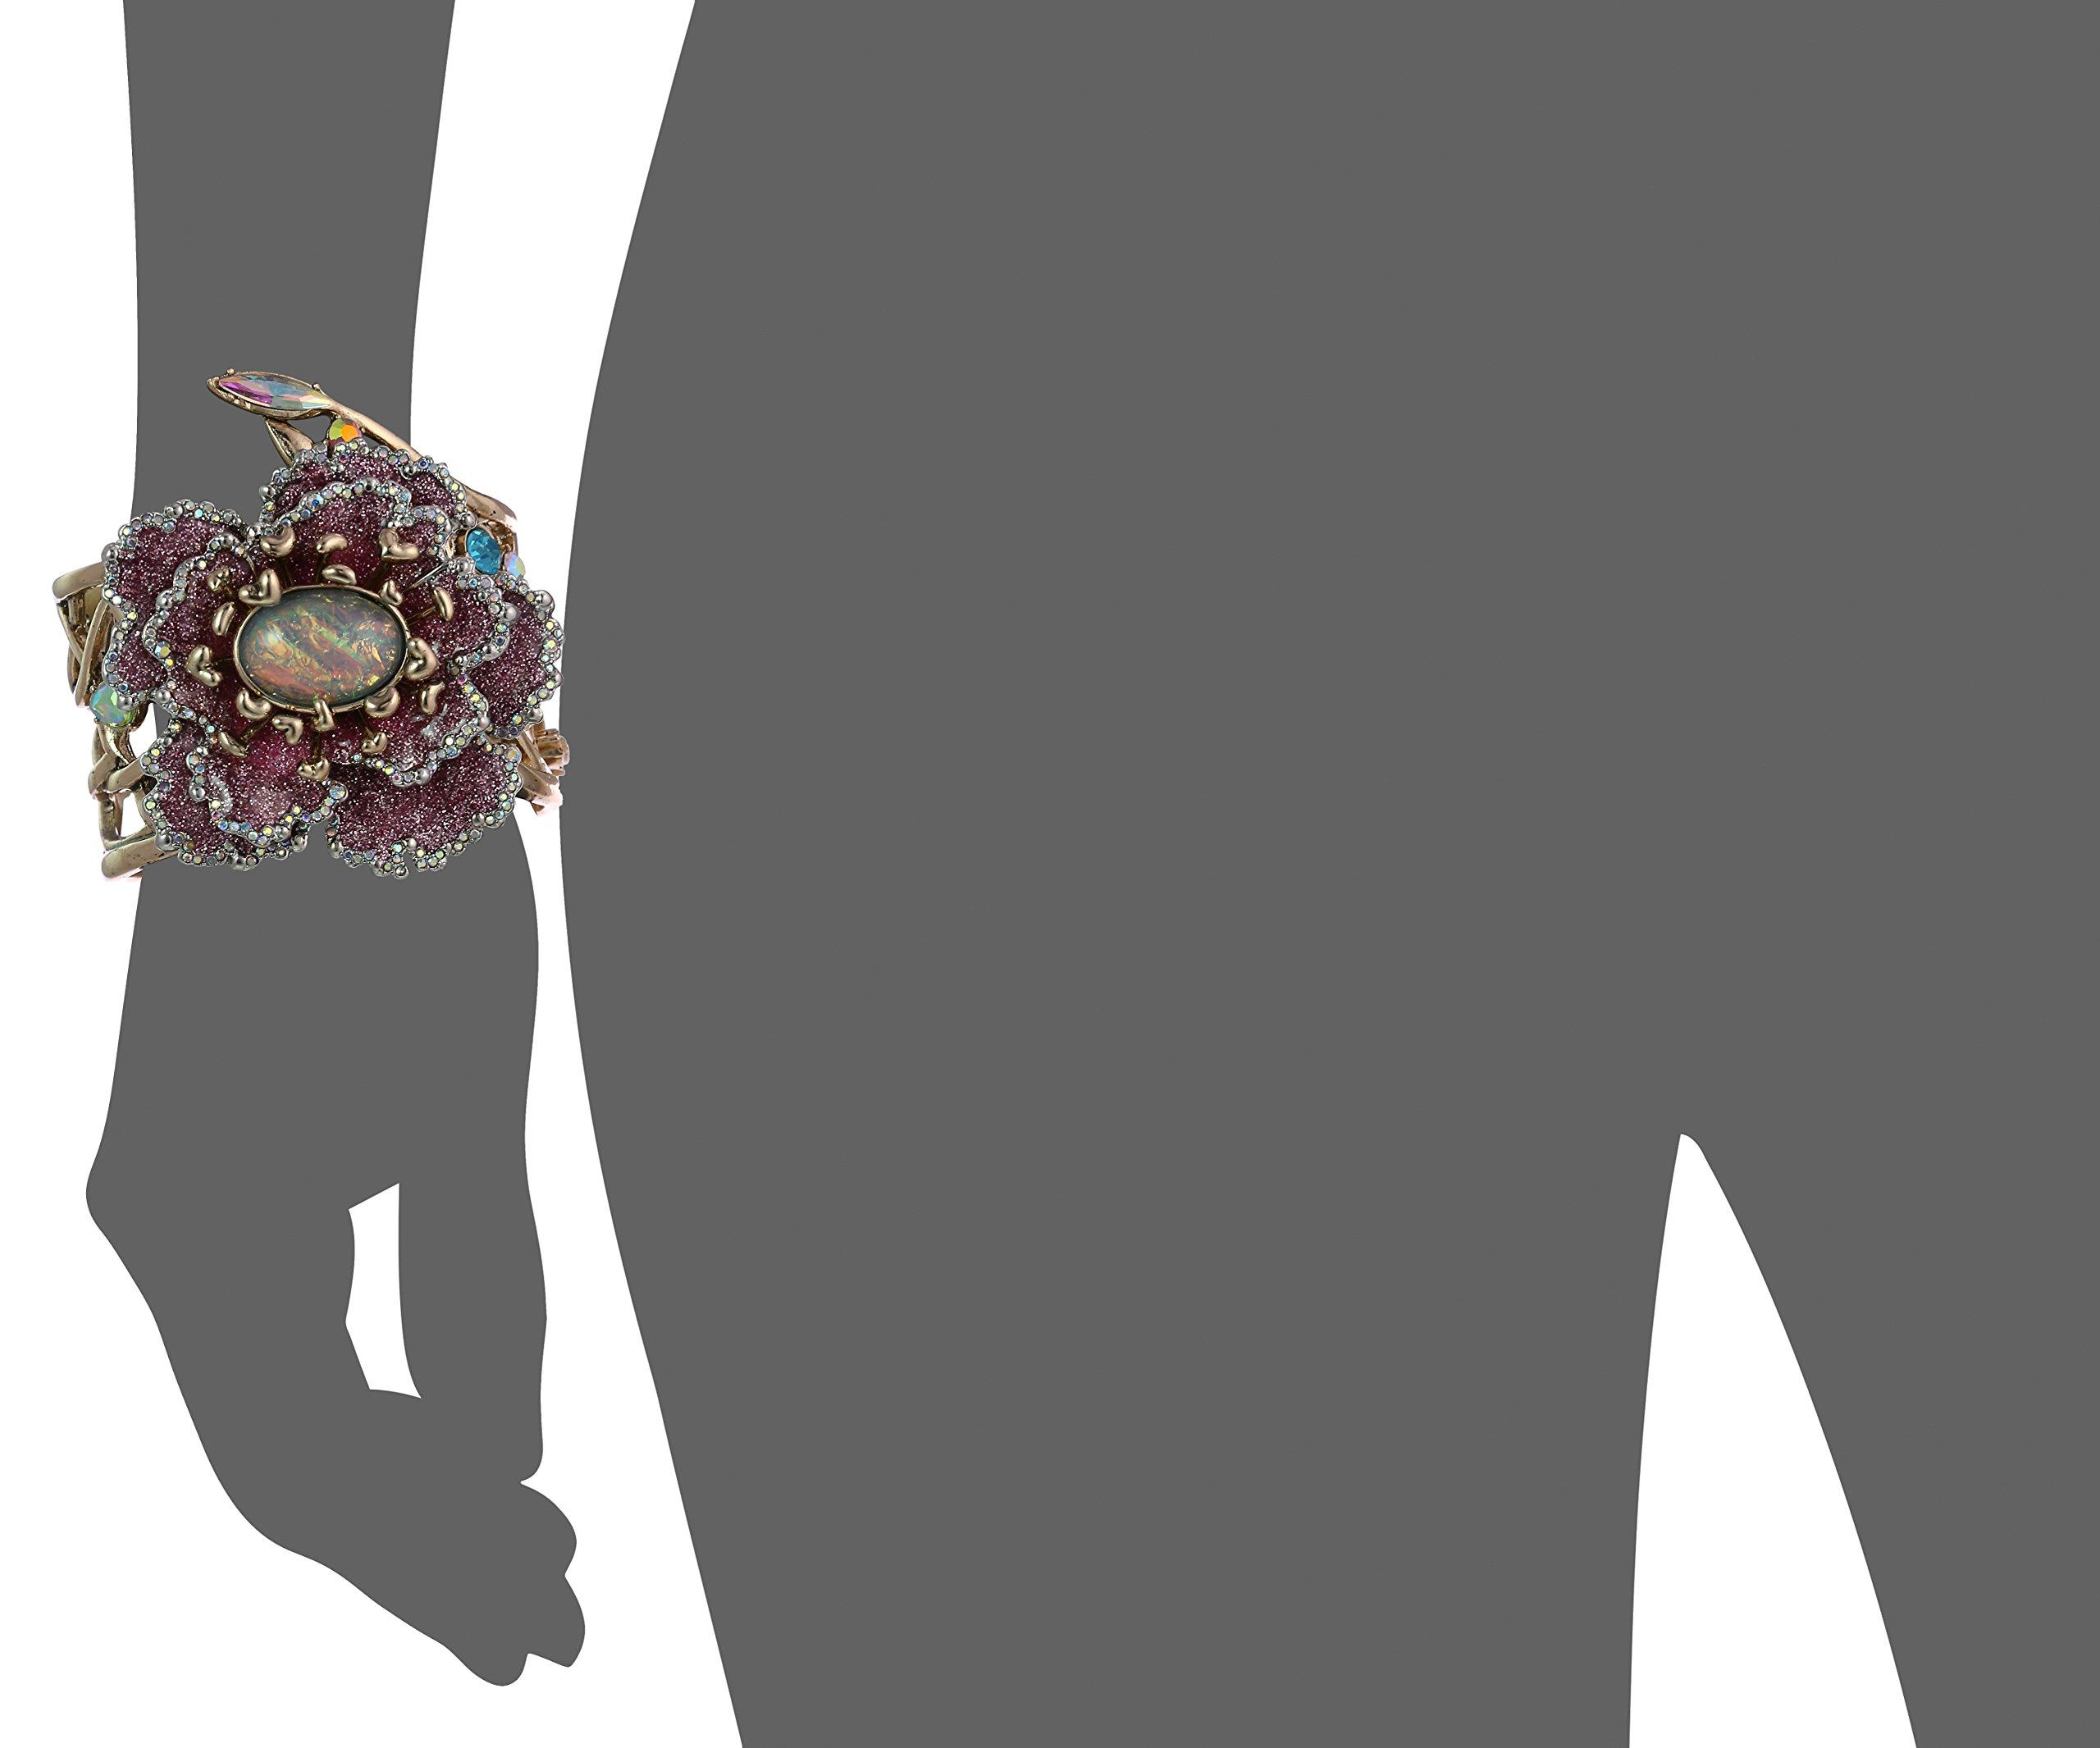 Betsey Johnson Womens Blooming Betsey Flower Hinge Statement Bracelet, Multi, One Size by Betsey Johnson (Image #2)